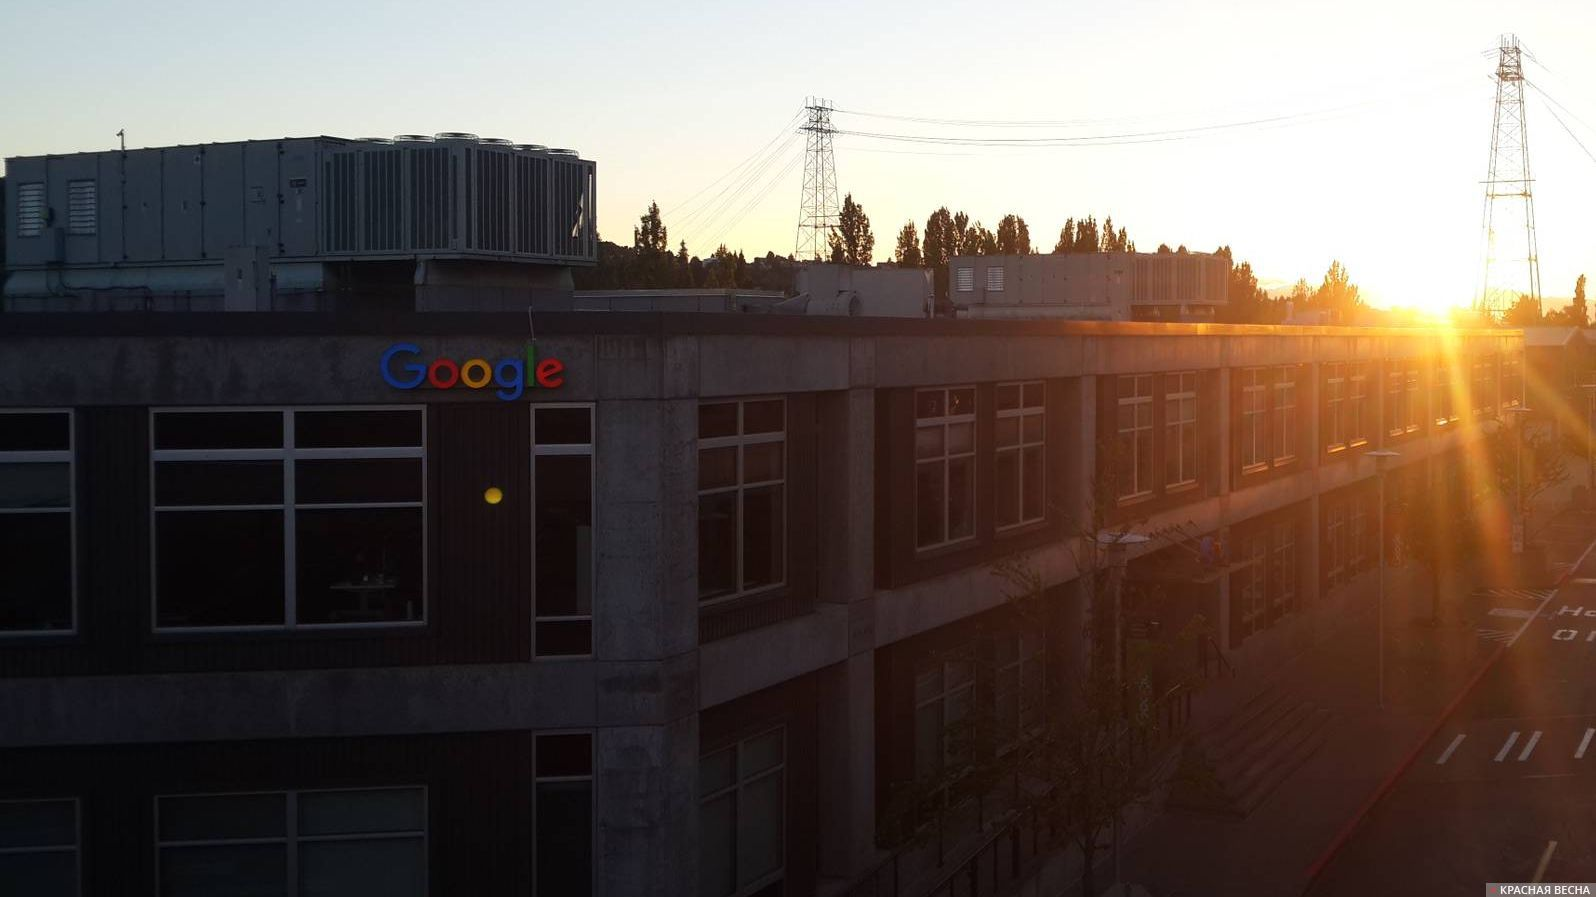 Офис Гугл. Сиэтл.